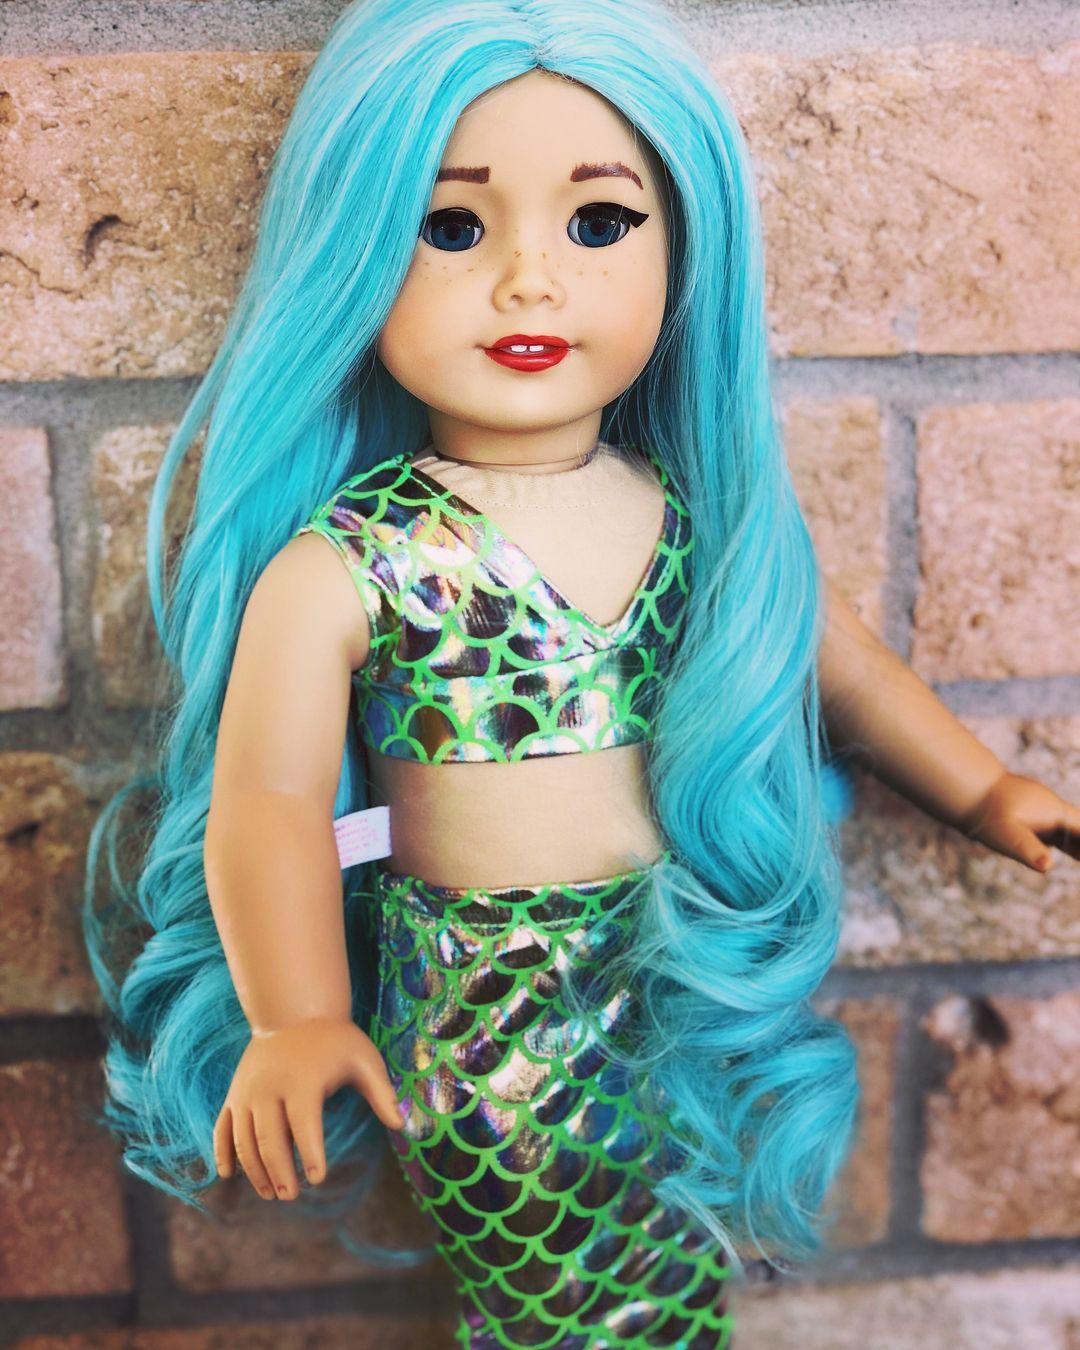 Kit got turned into a Beautiful Custom Mermaid. Swipe to